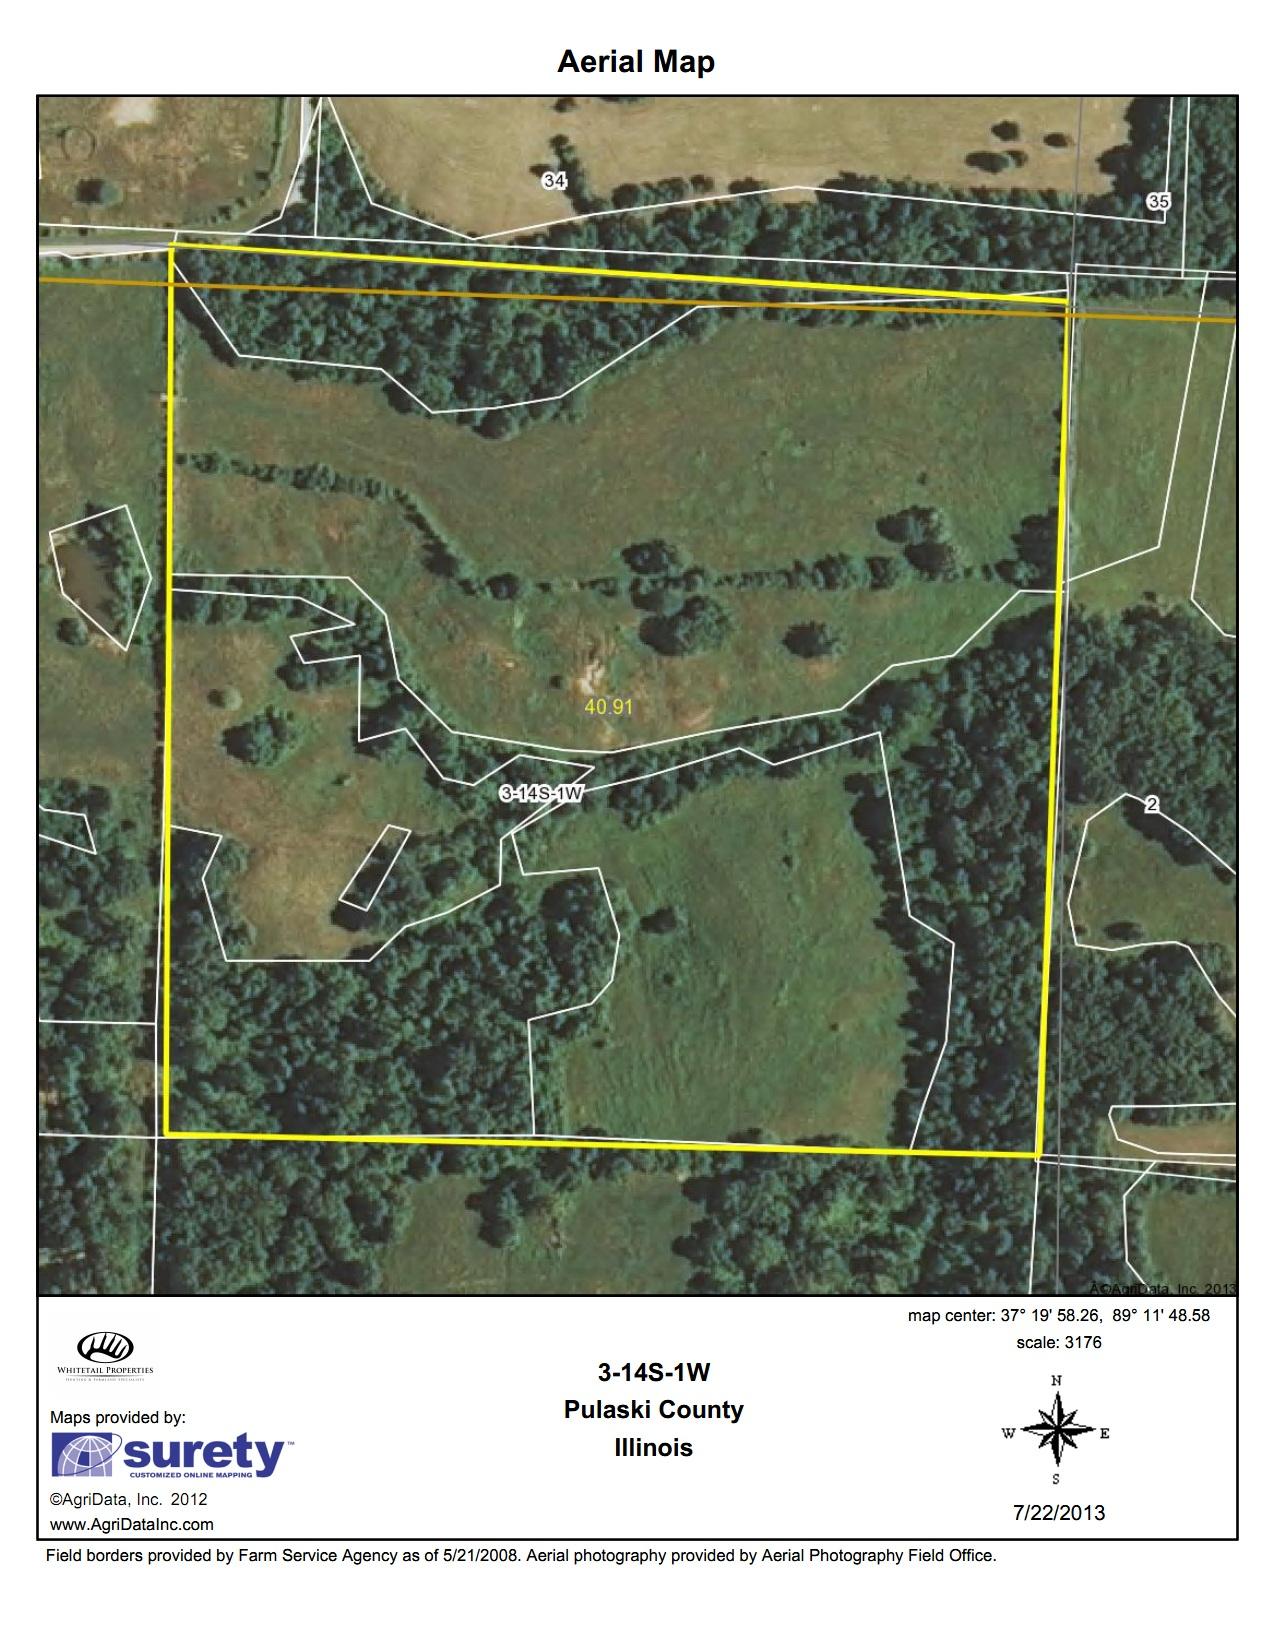 Illinois pulaski county mounds - Fsa Aerial Map Pulaski 120 Tra